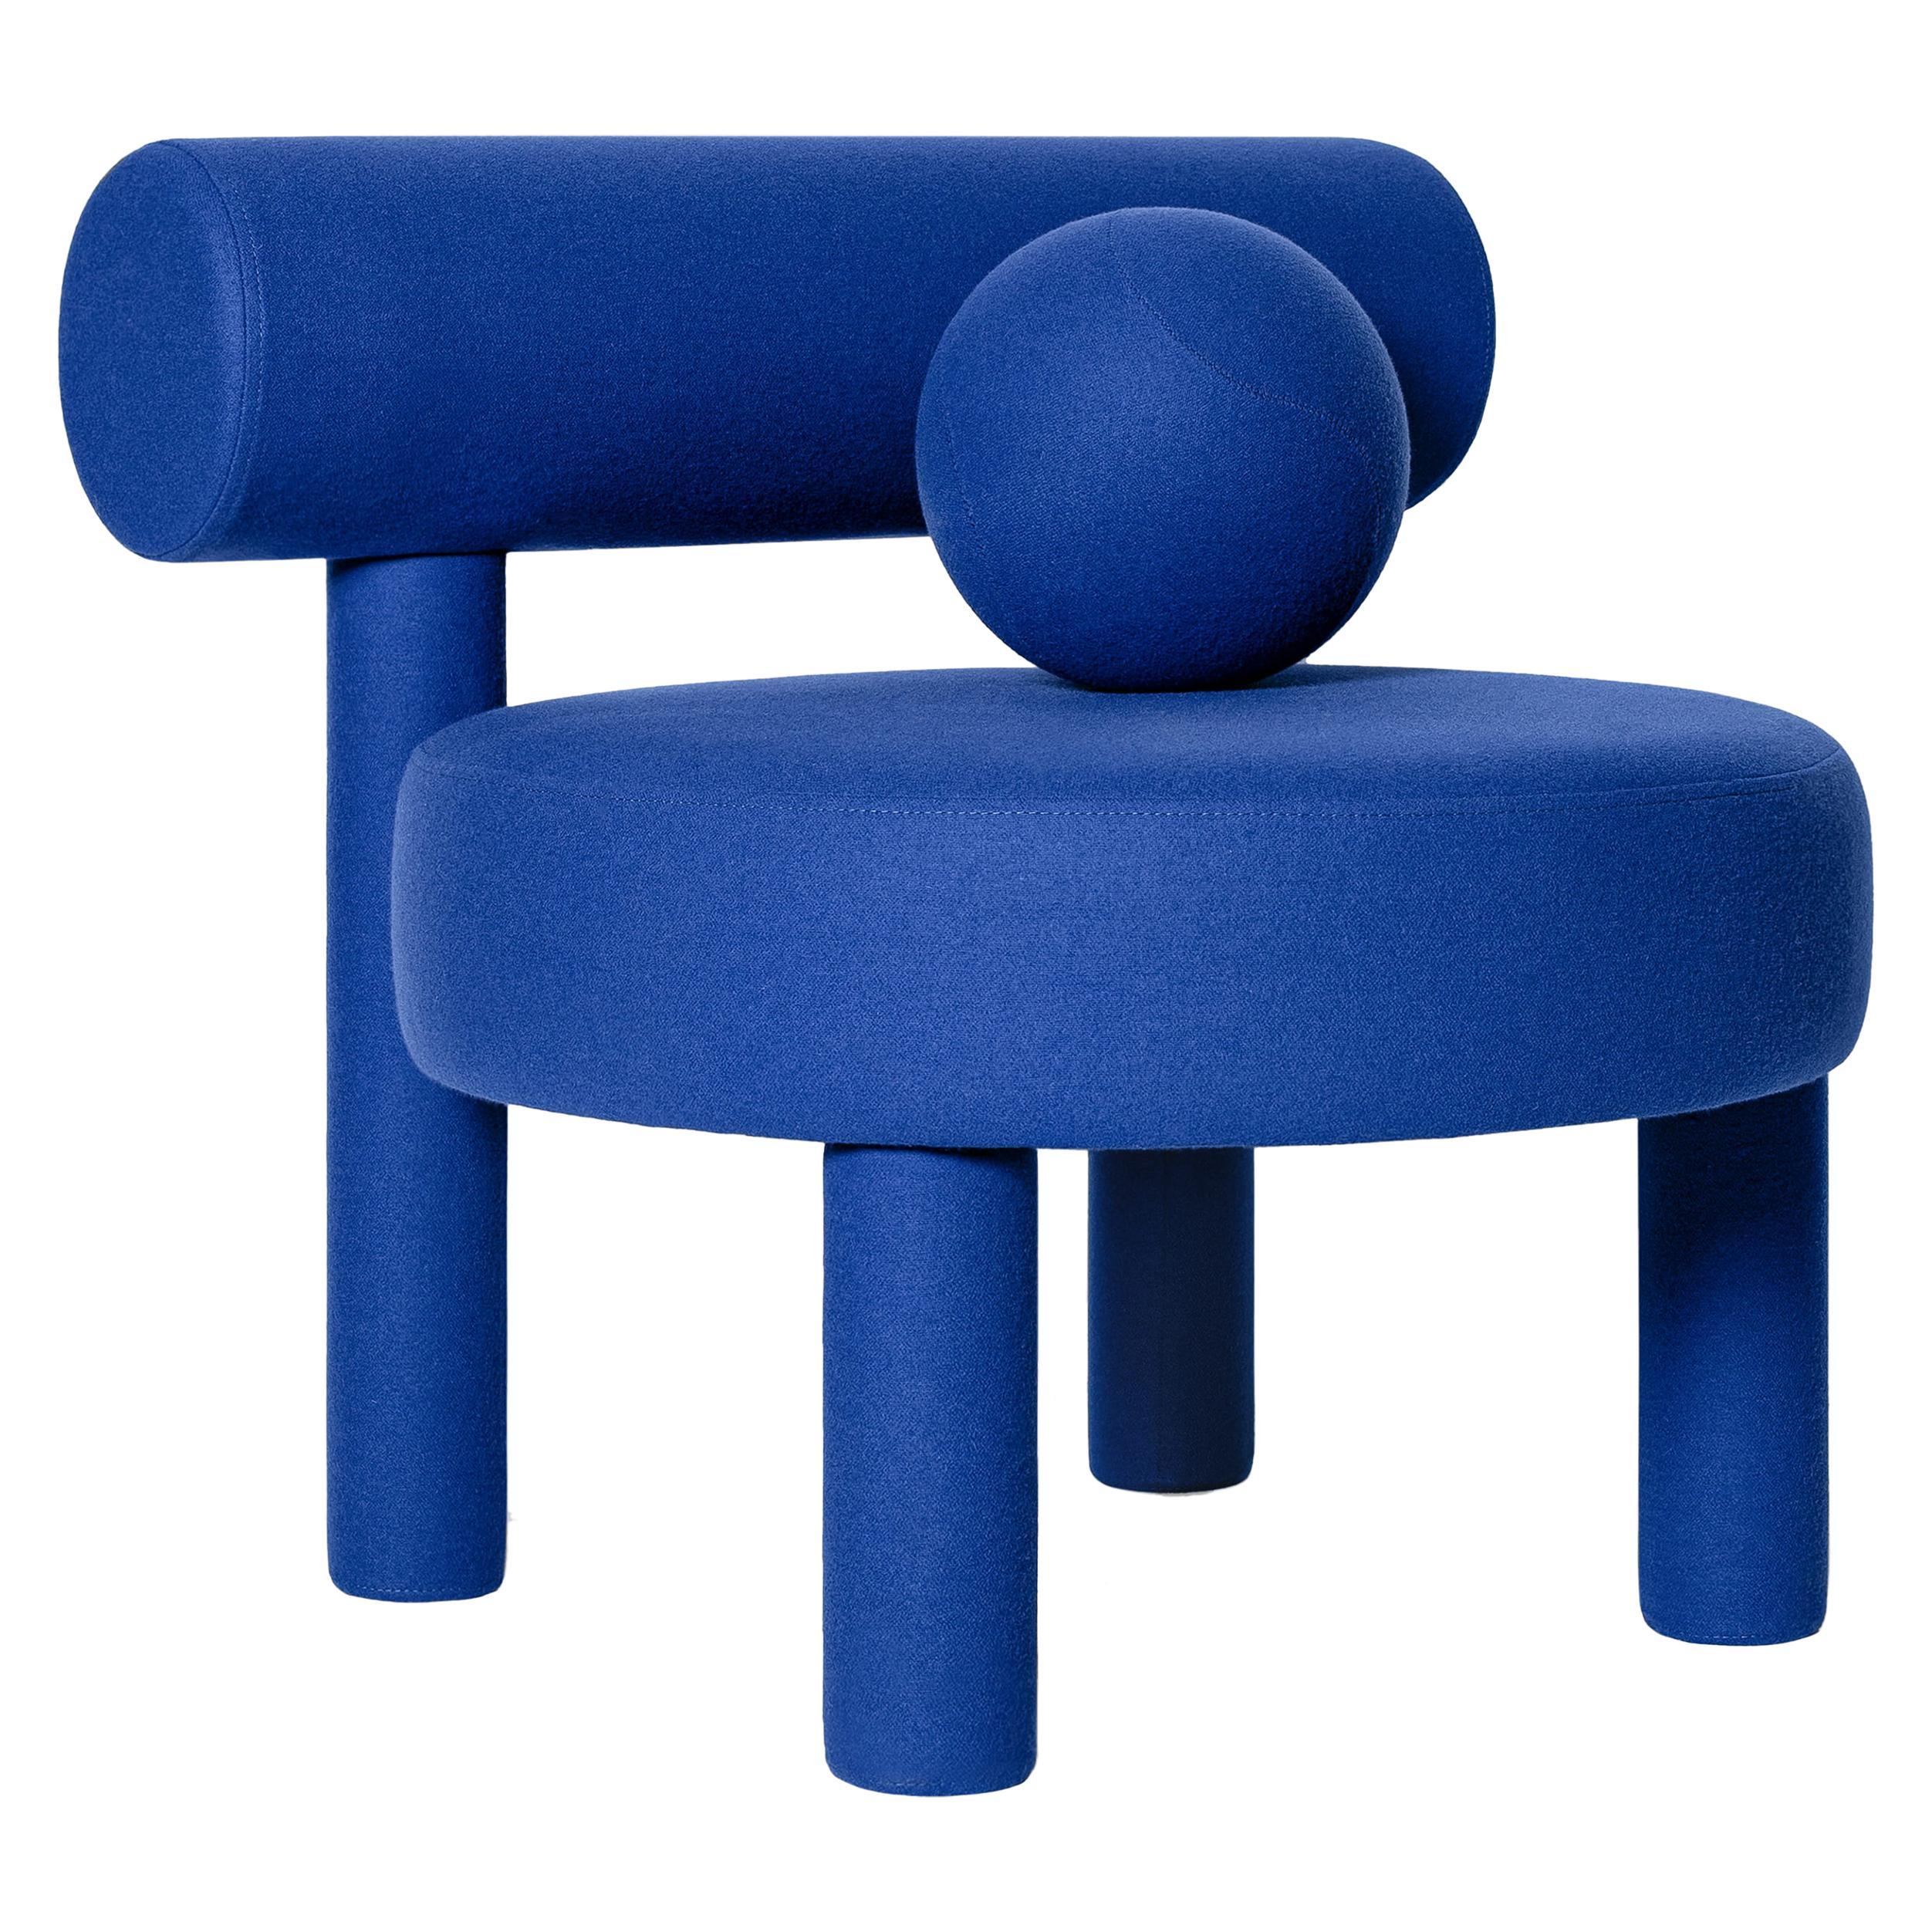 Modern Low Chair Gropius CS1 in Fire Retardant Wool fabric by NOOM